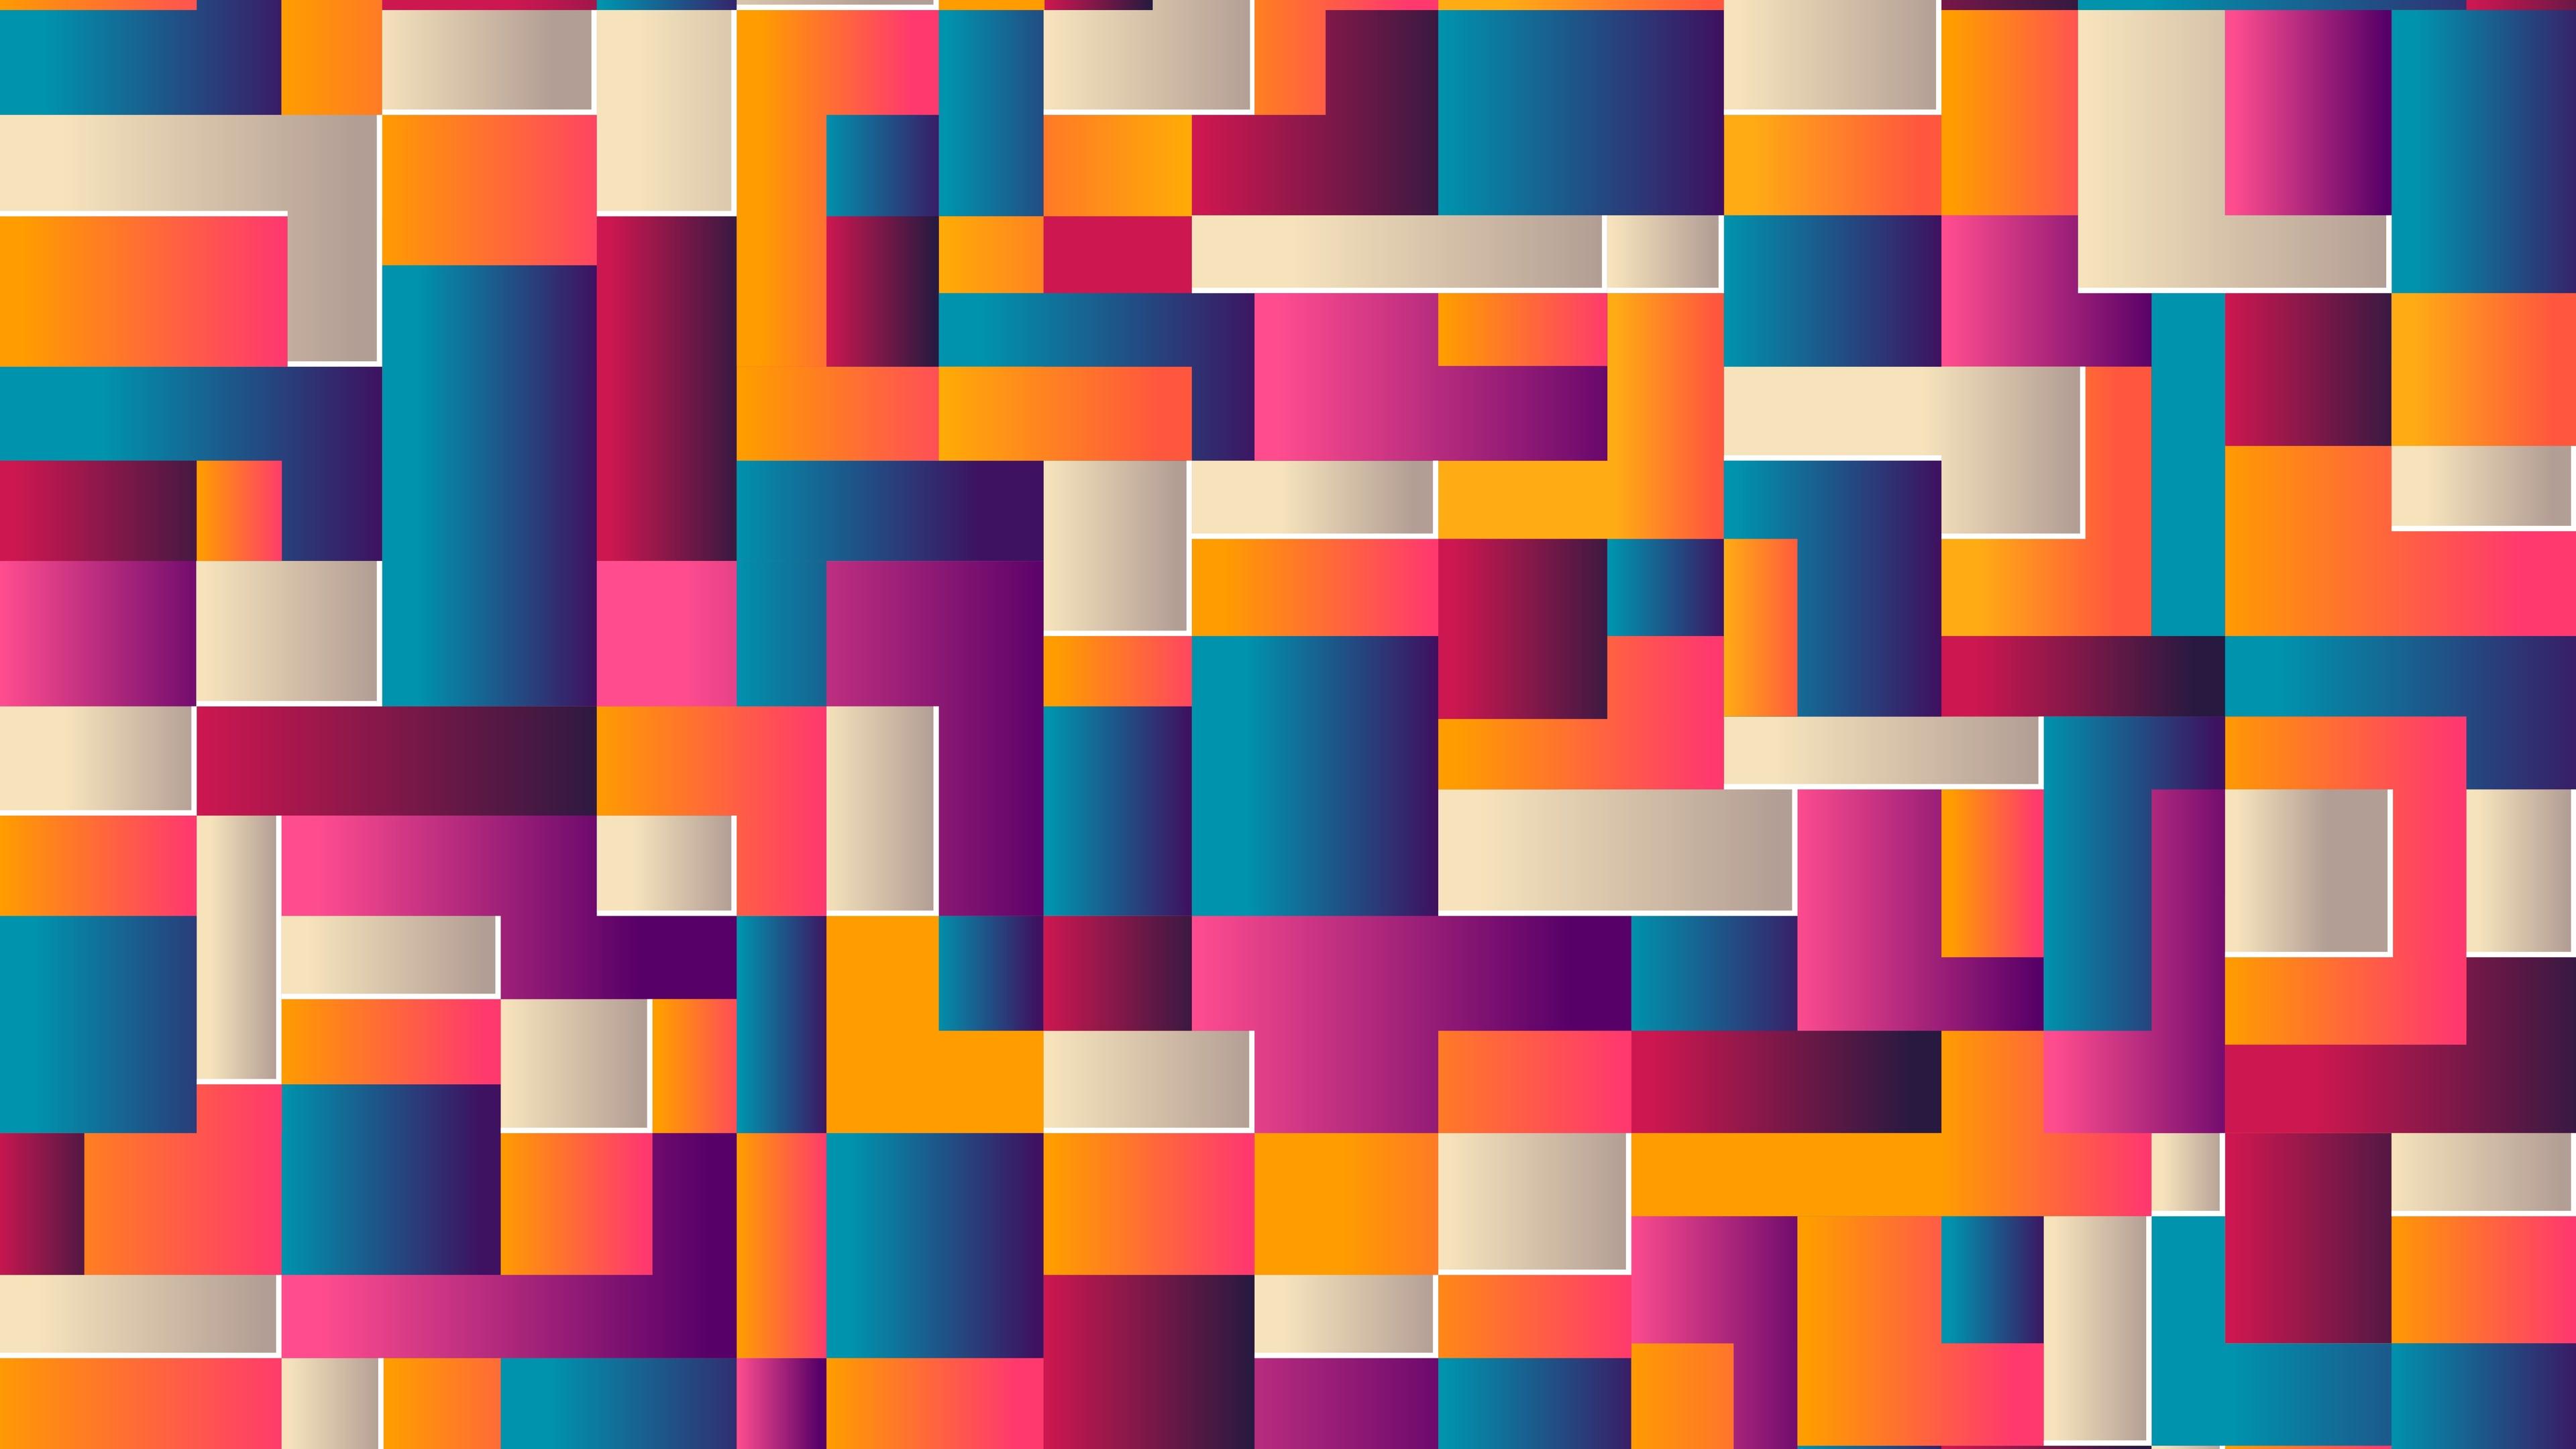 colorful shapes abstract 1539371268 - Colorful Shapes Abstract - shapes wallpapers, hd-wallpapers, colorful wallpapers, abstract wallpapers, 5k wallpapers, 4k-wallpapers